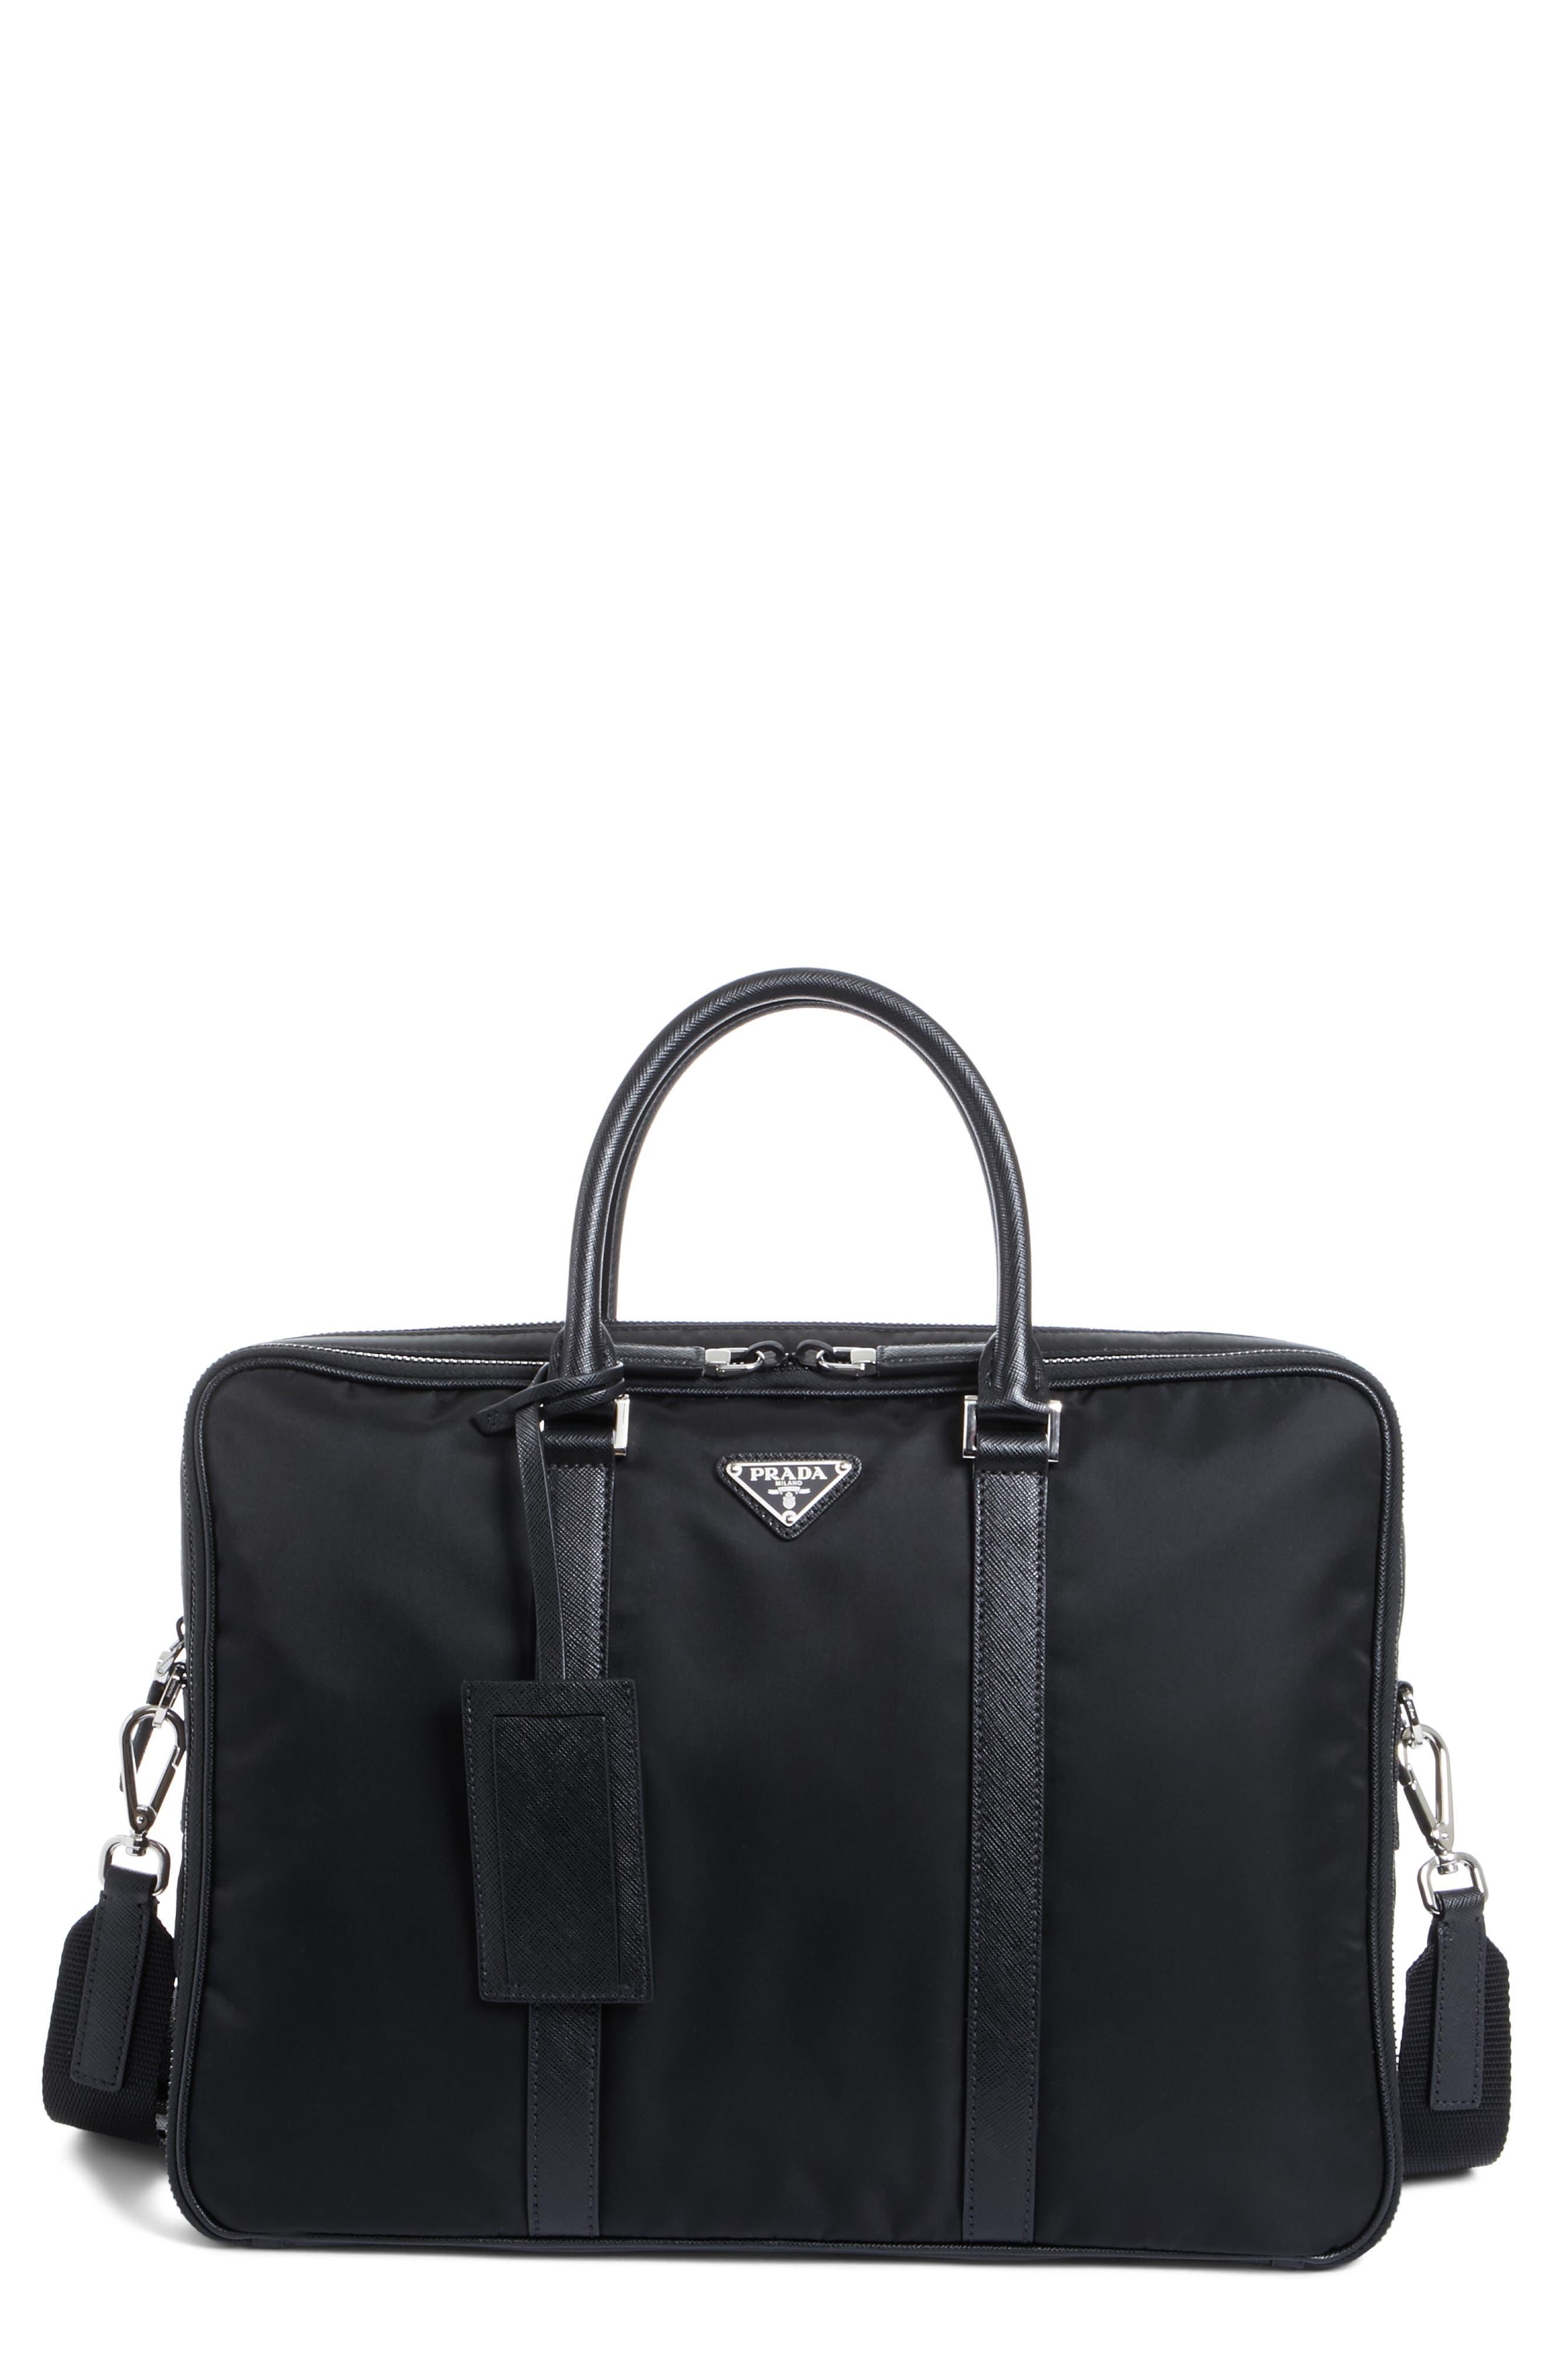 Alternate Image 1 Selected - Prada Nylon Briefcase with Saffiano Leather Trim